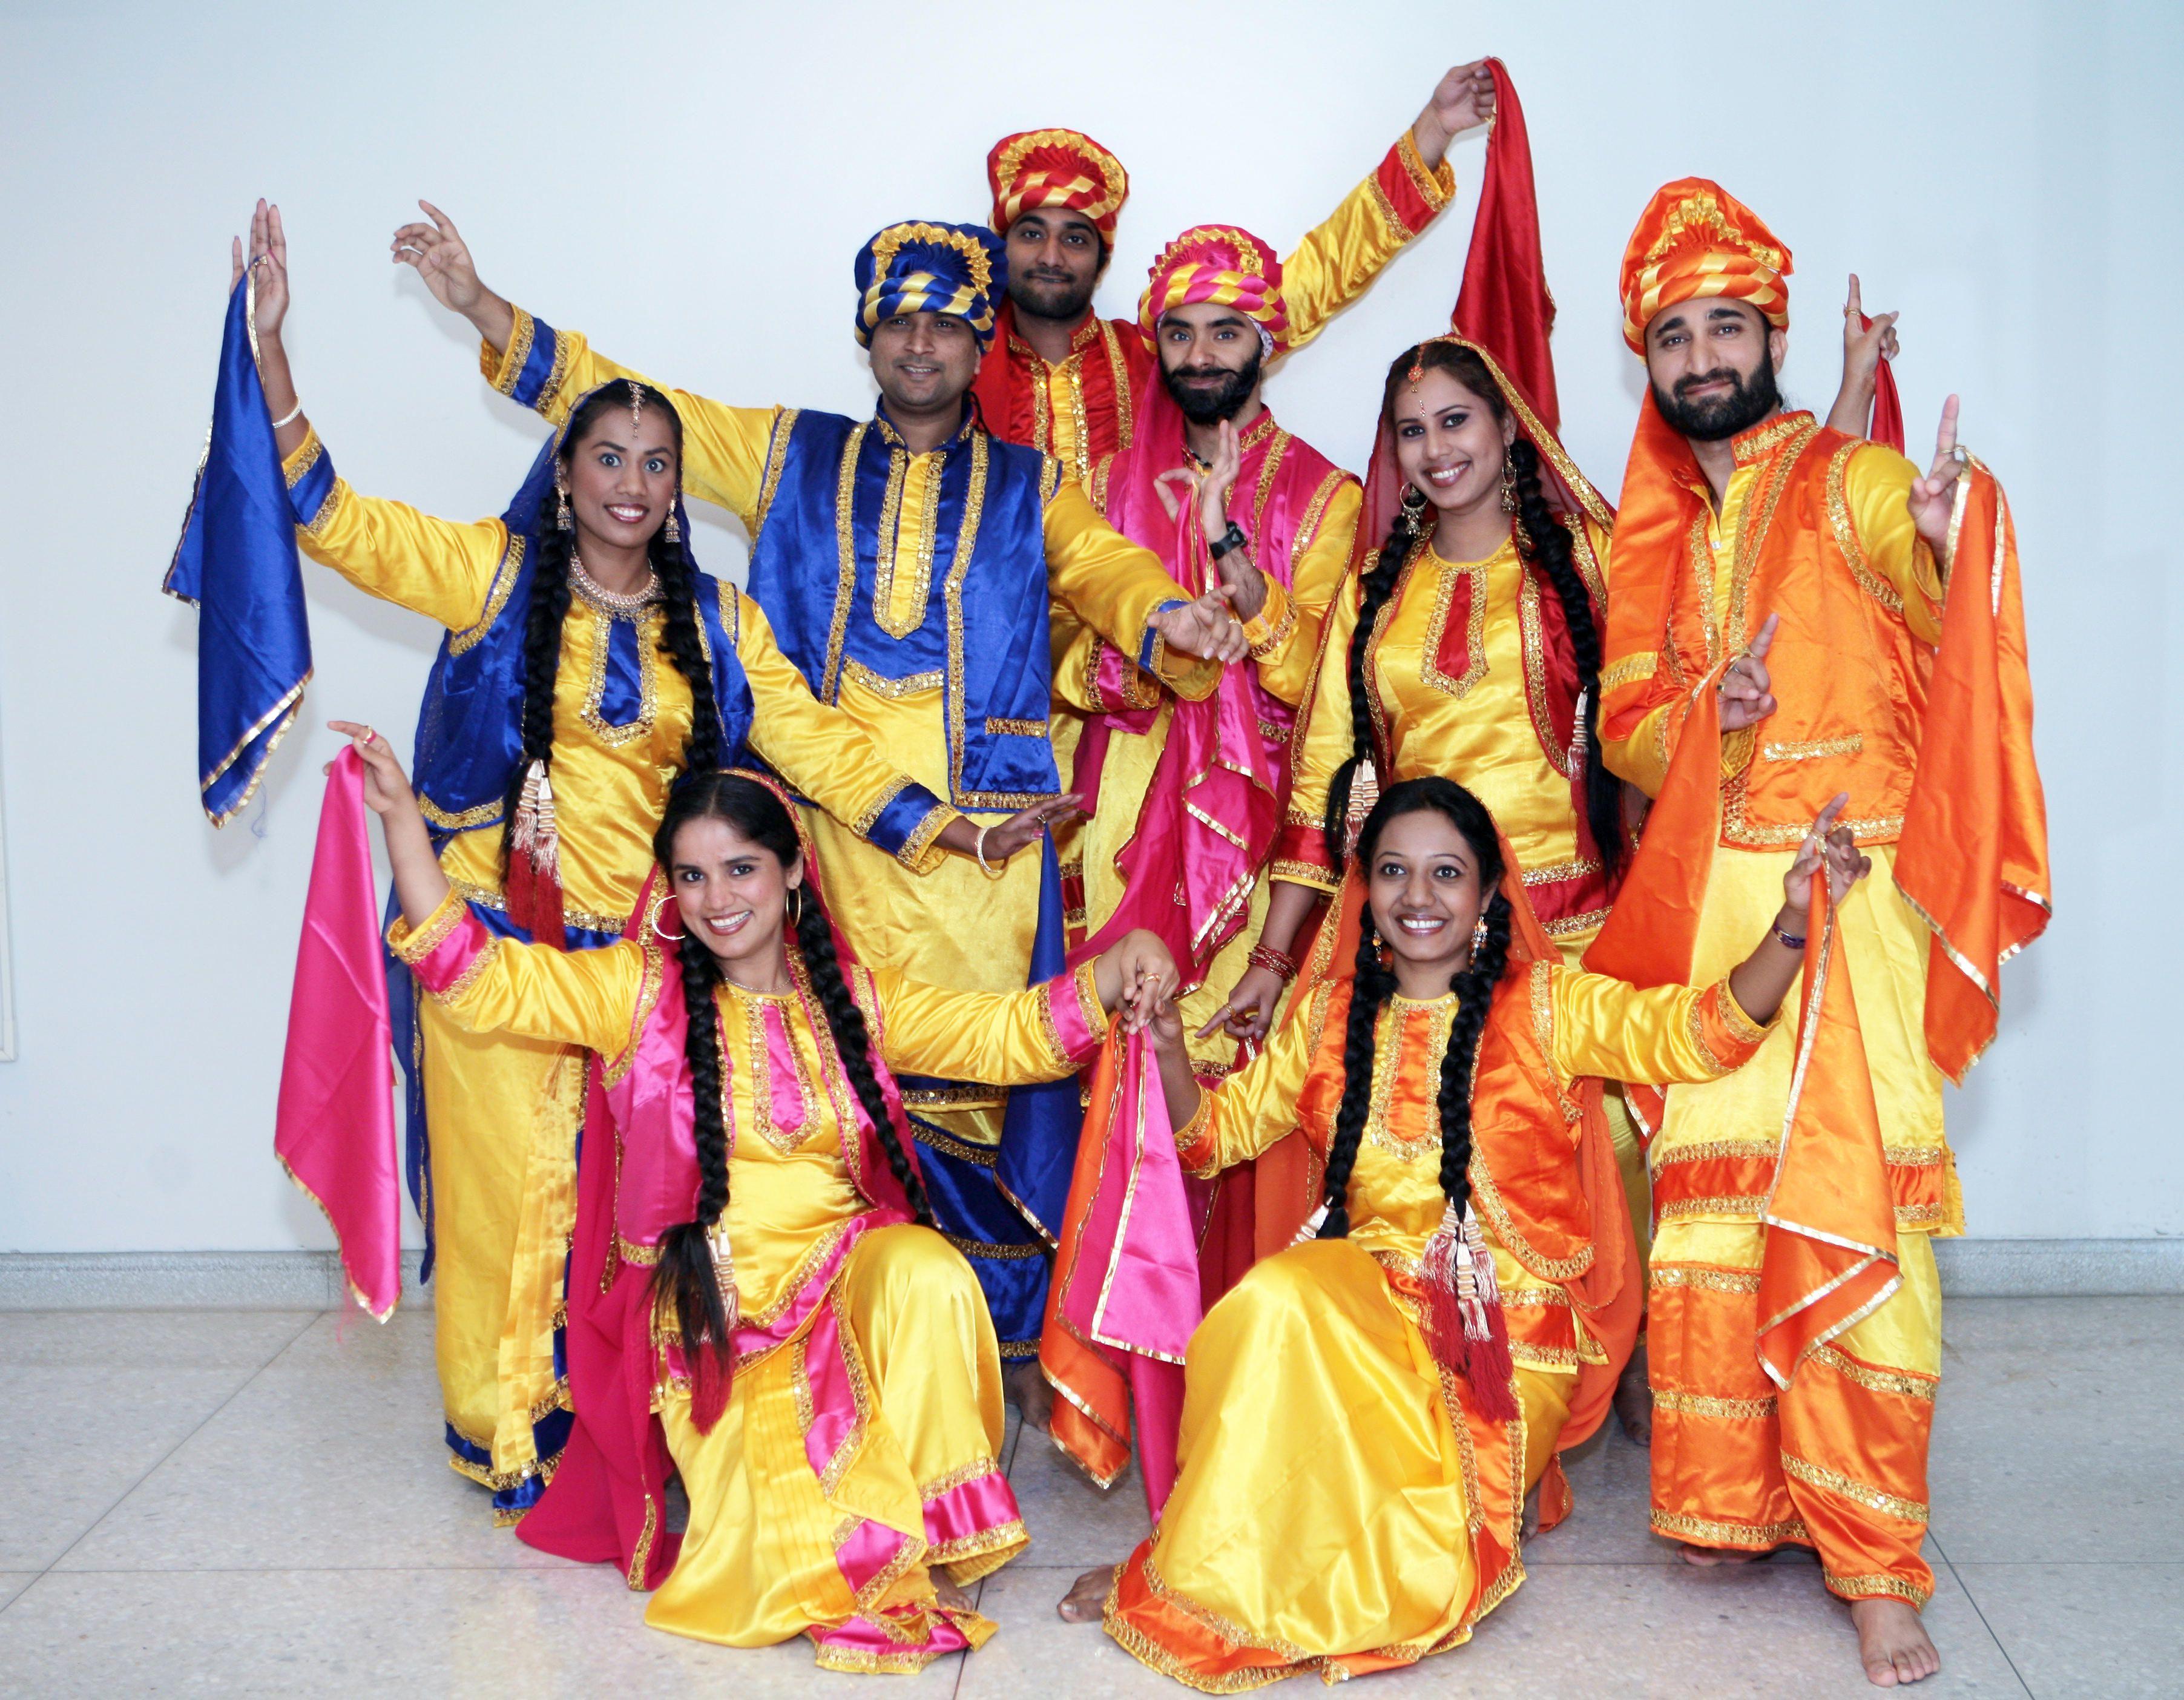 NYC Bhangra   Spreading Joy & Awareness Through Dance